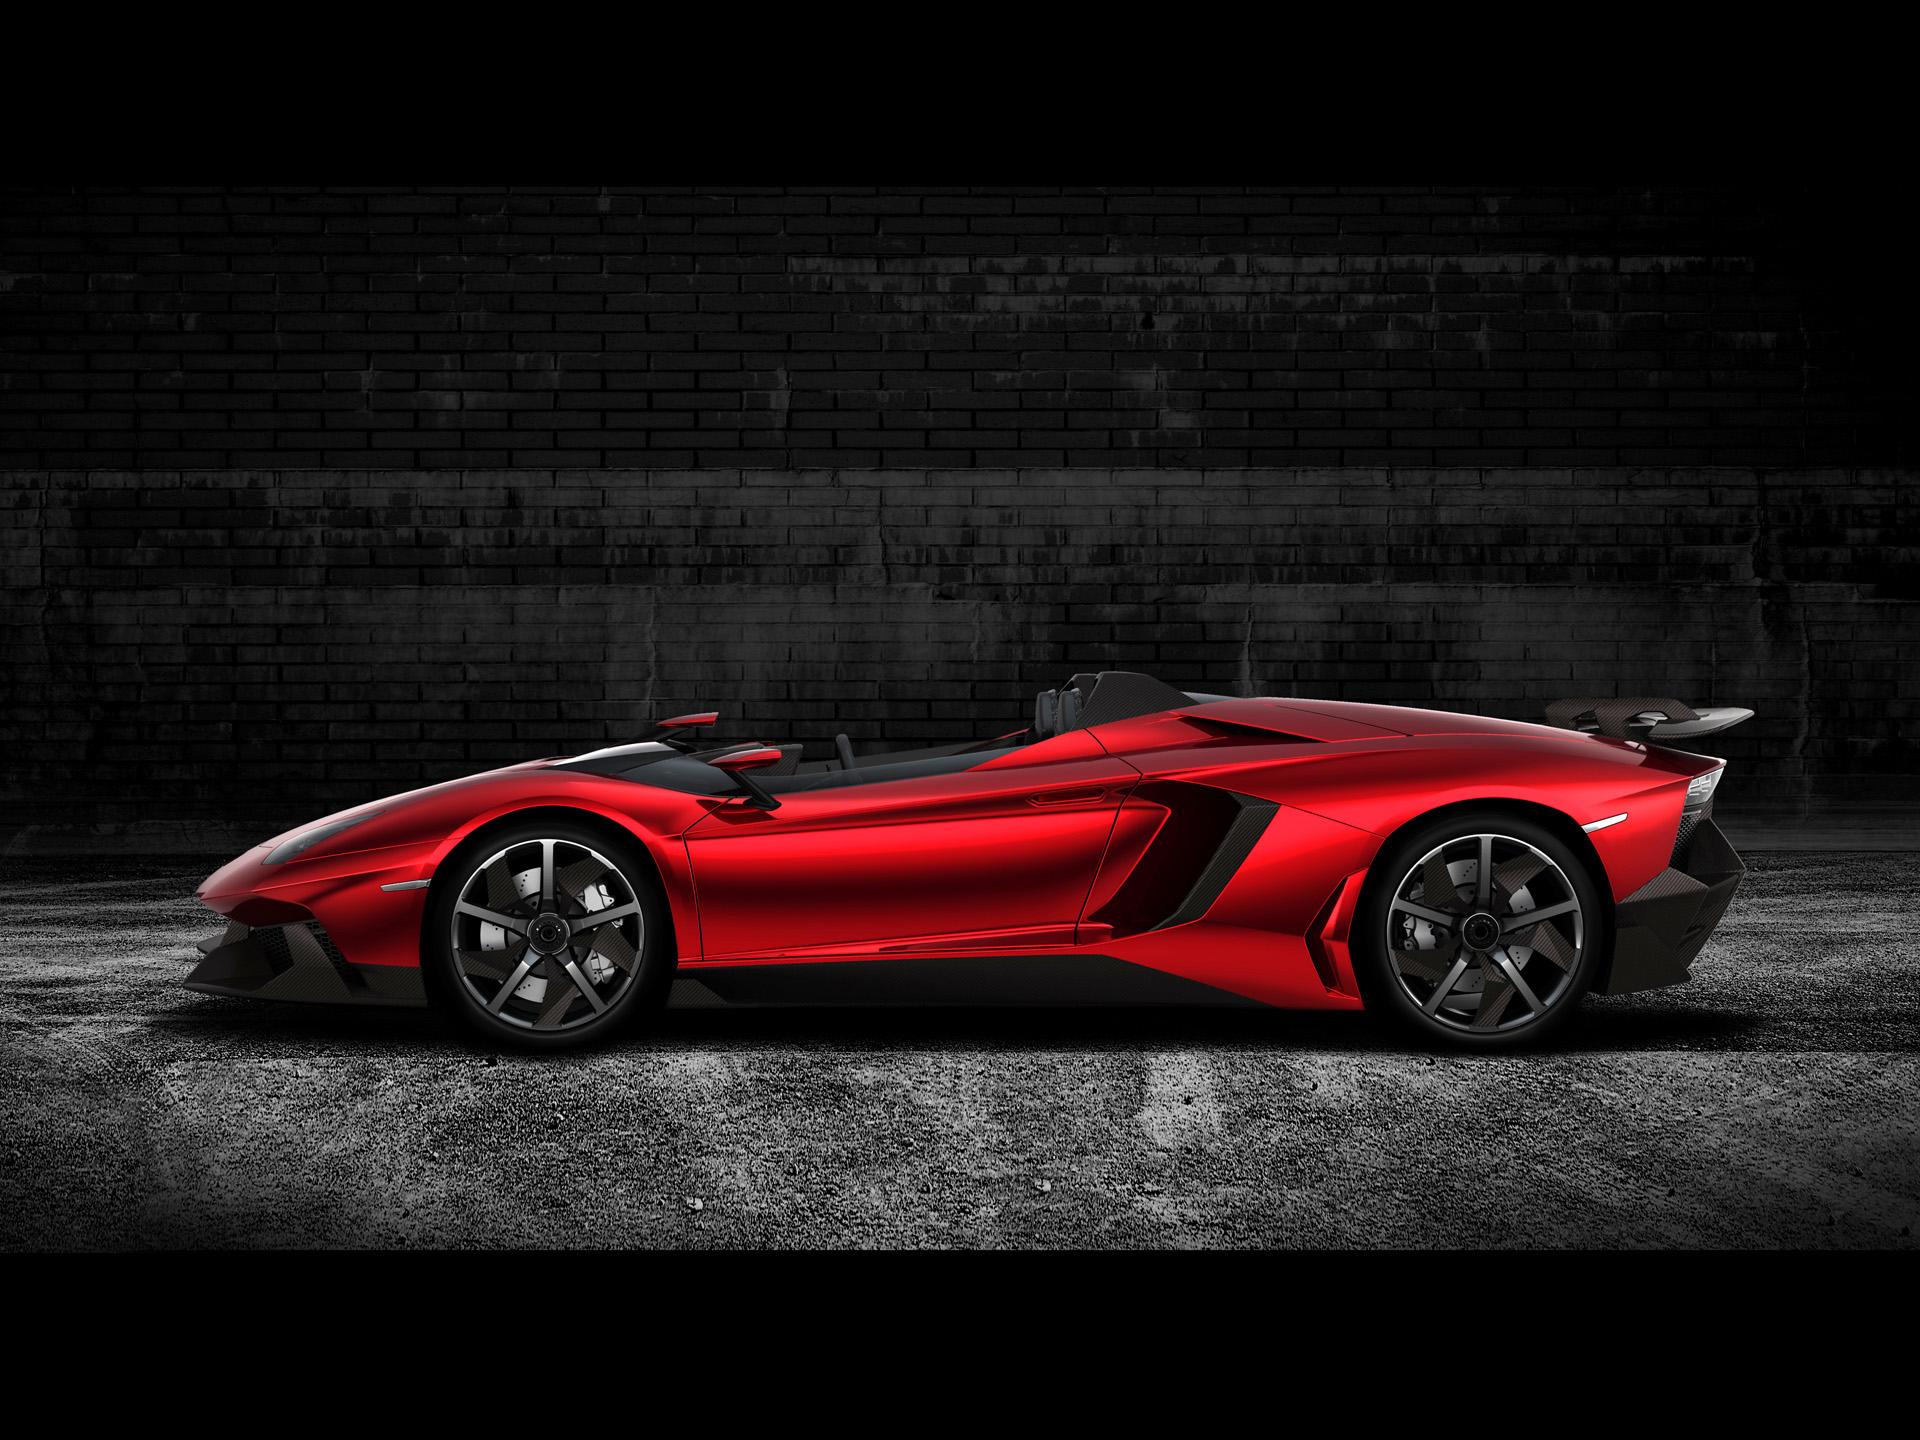 Lamborghini Aventador J Wallpaper Gallery Wallpaper